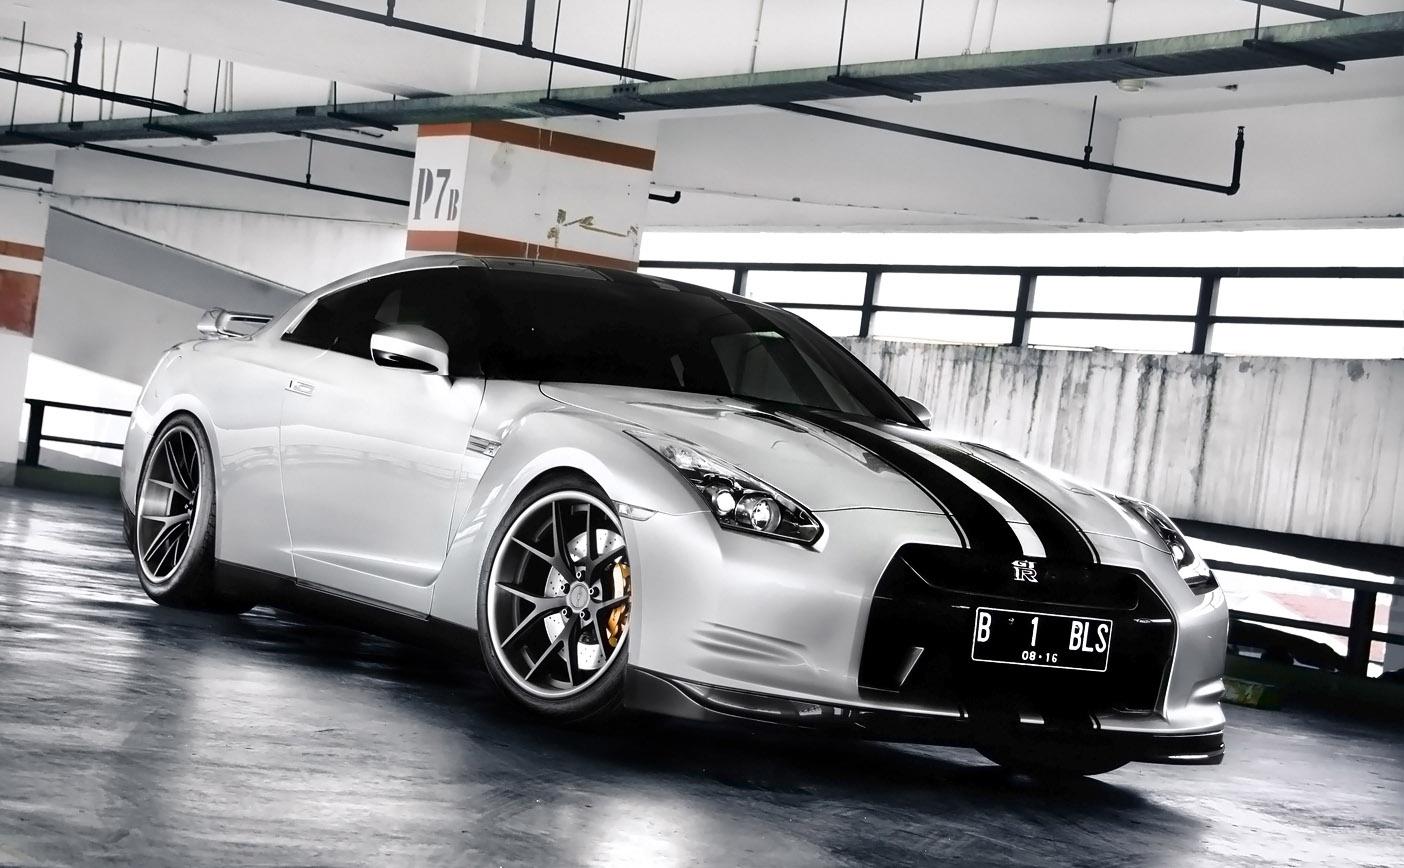 Pur Wheels On Nissan Gt R